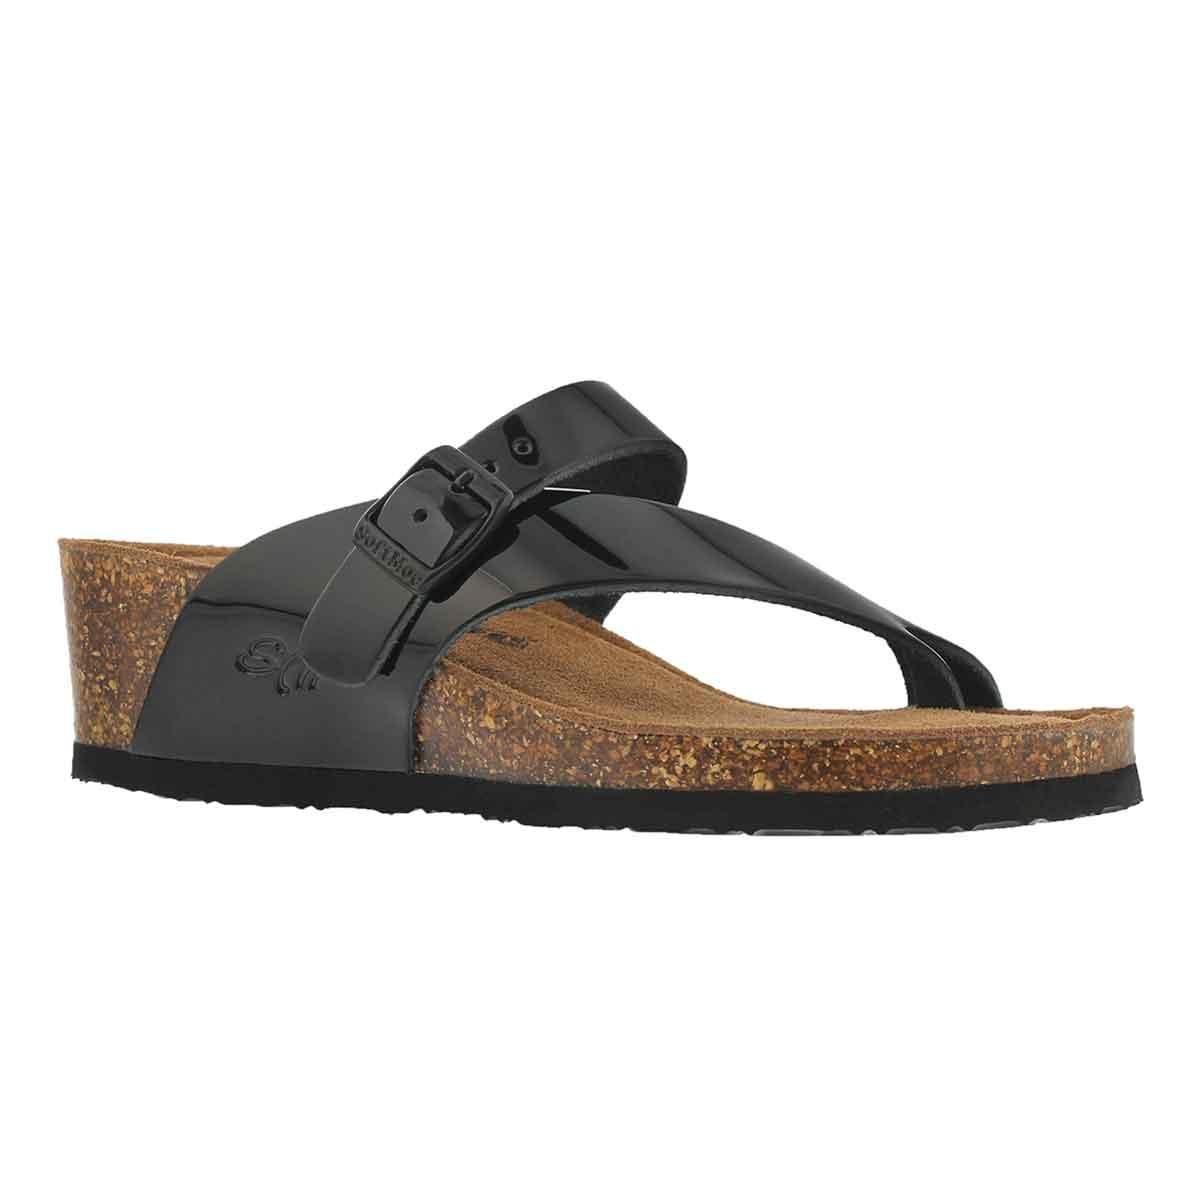 Lds Andrea 5 blk pat mem foam wdg sandal